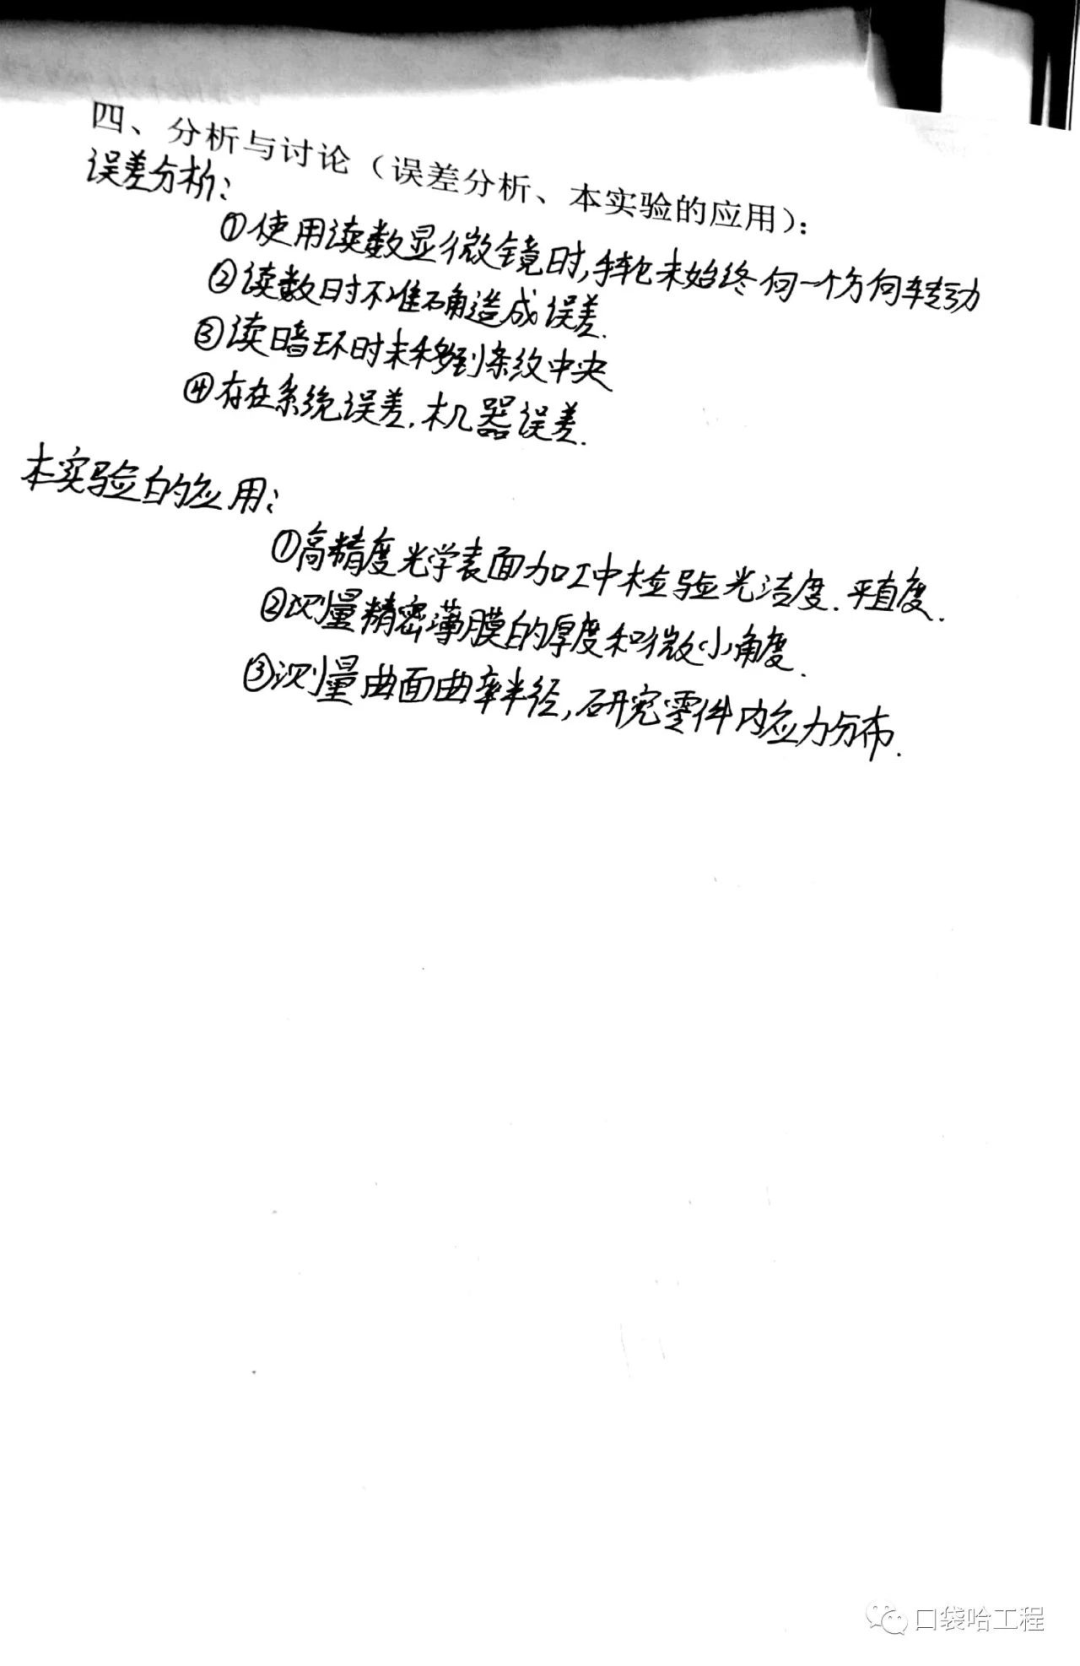 ee4534d5a22e68555e5200d0a9a631e0.png